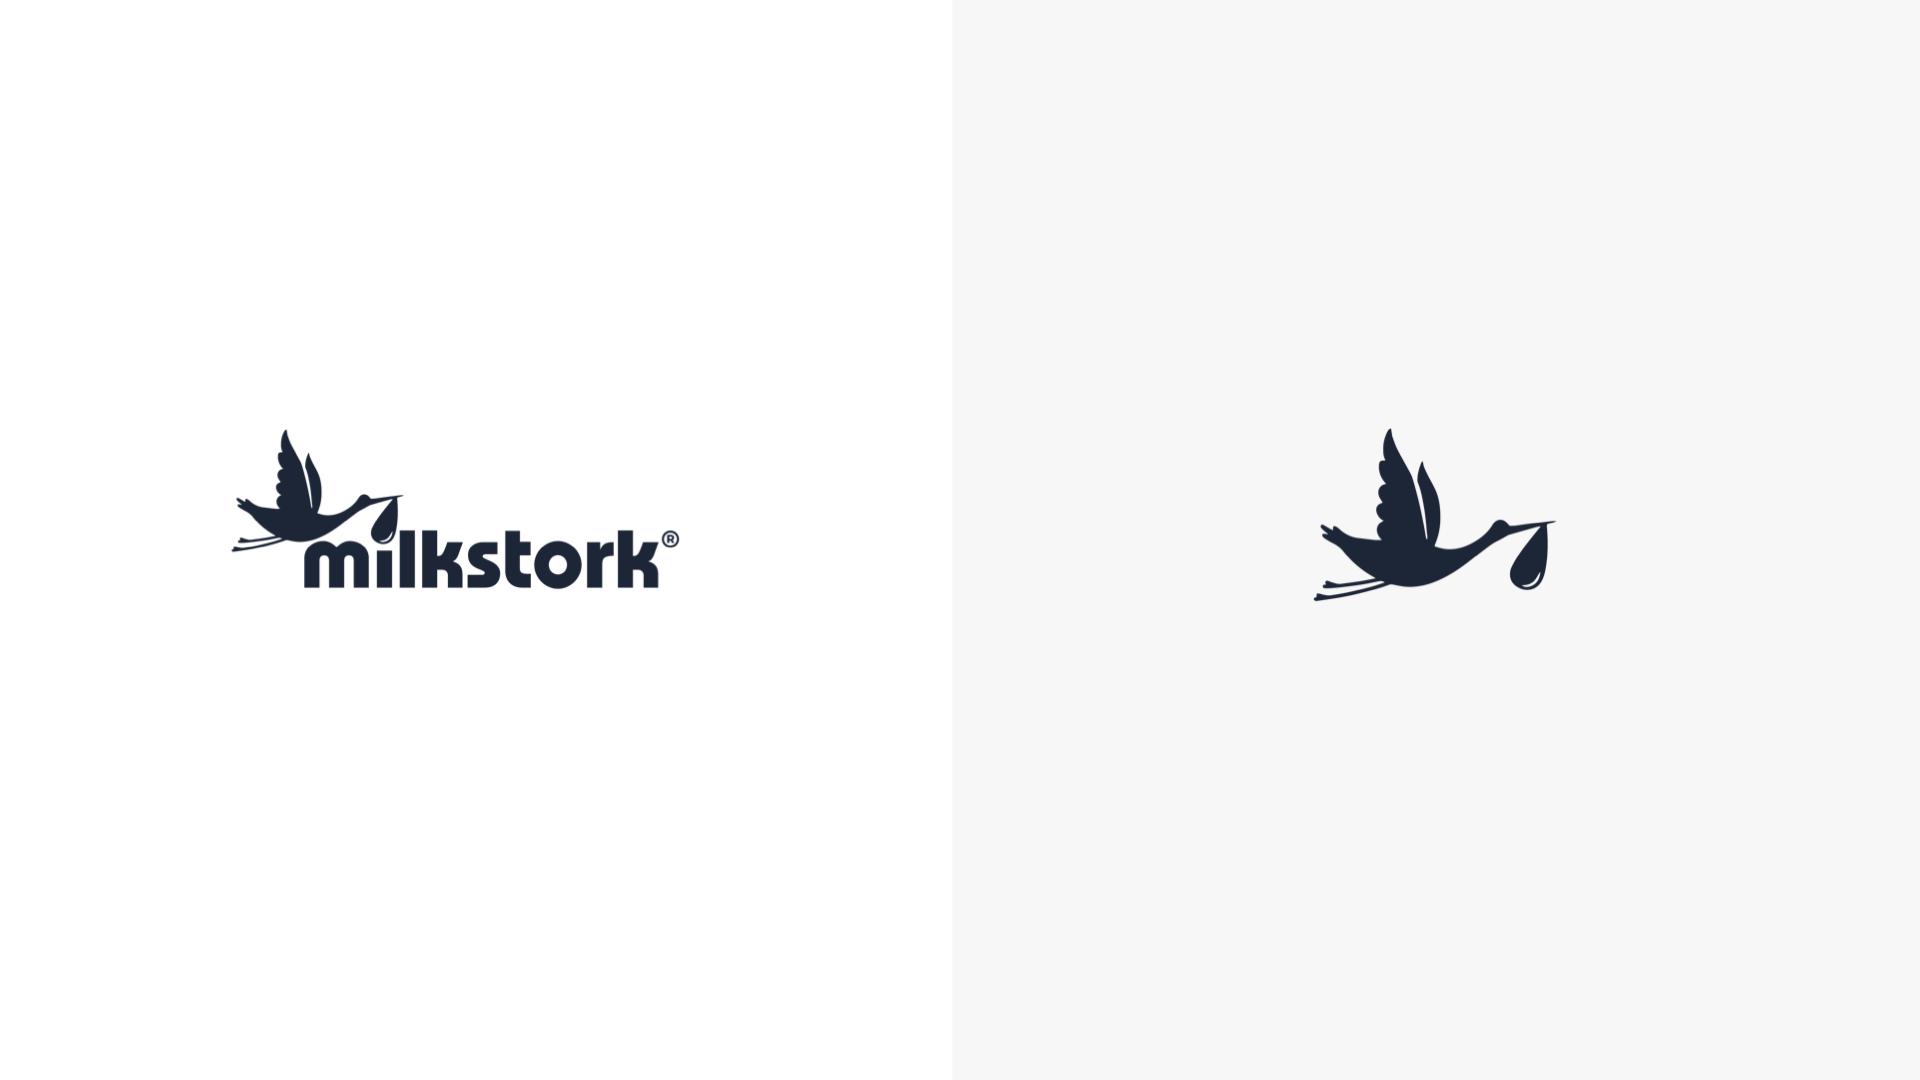 milkstork logo.001.jpeg